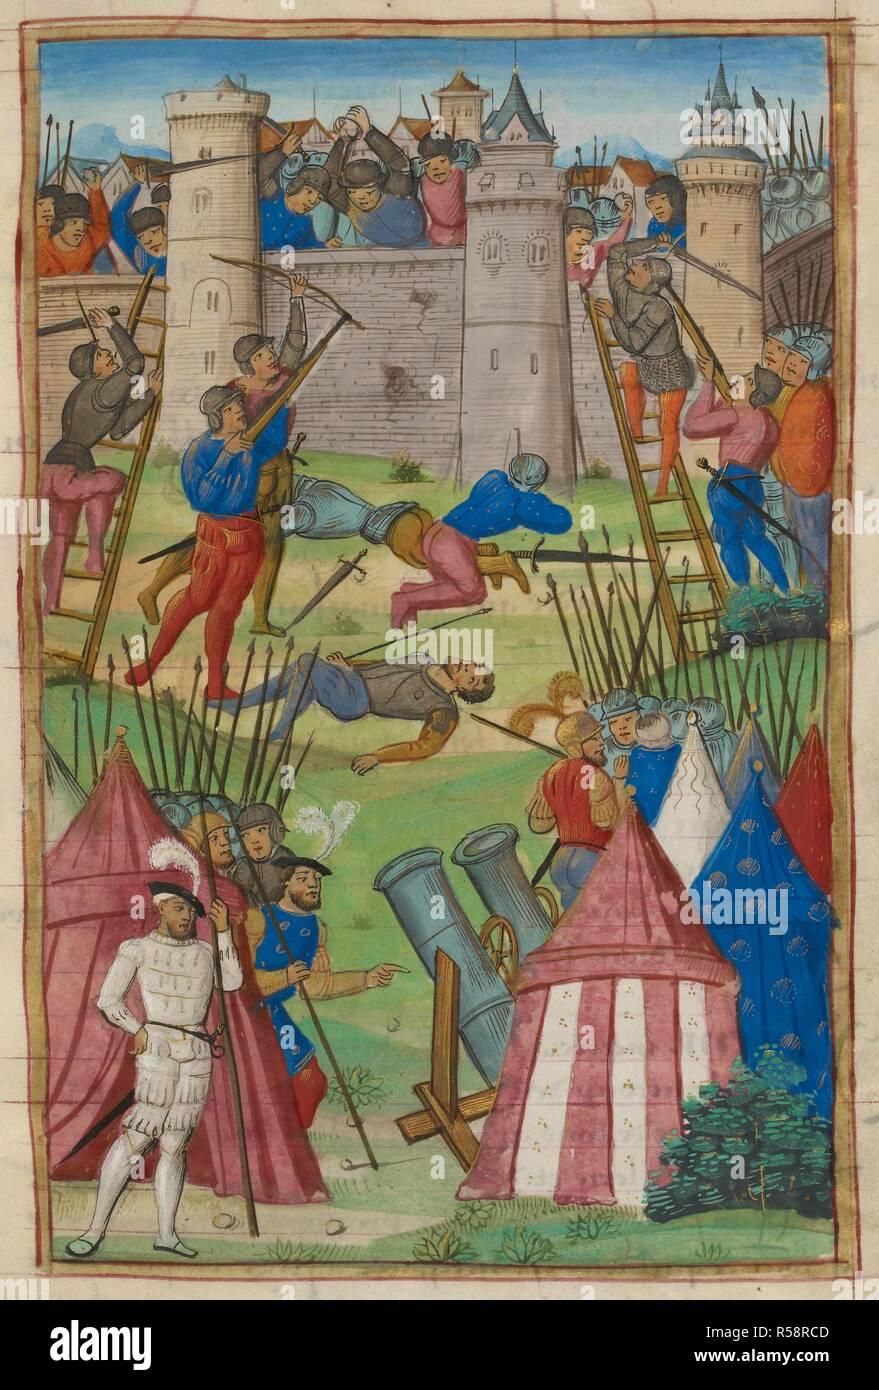 Siege Ladder : siege, ladder, Medieval, Siege, Scene., Ladders, Artillery, Being, Used., TREATISE, Military, Discipline,, French,, Beginning,